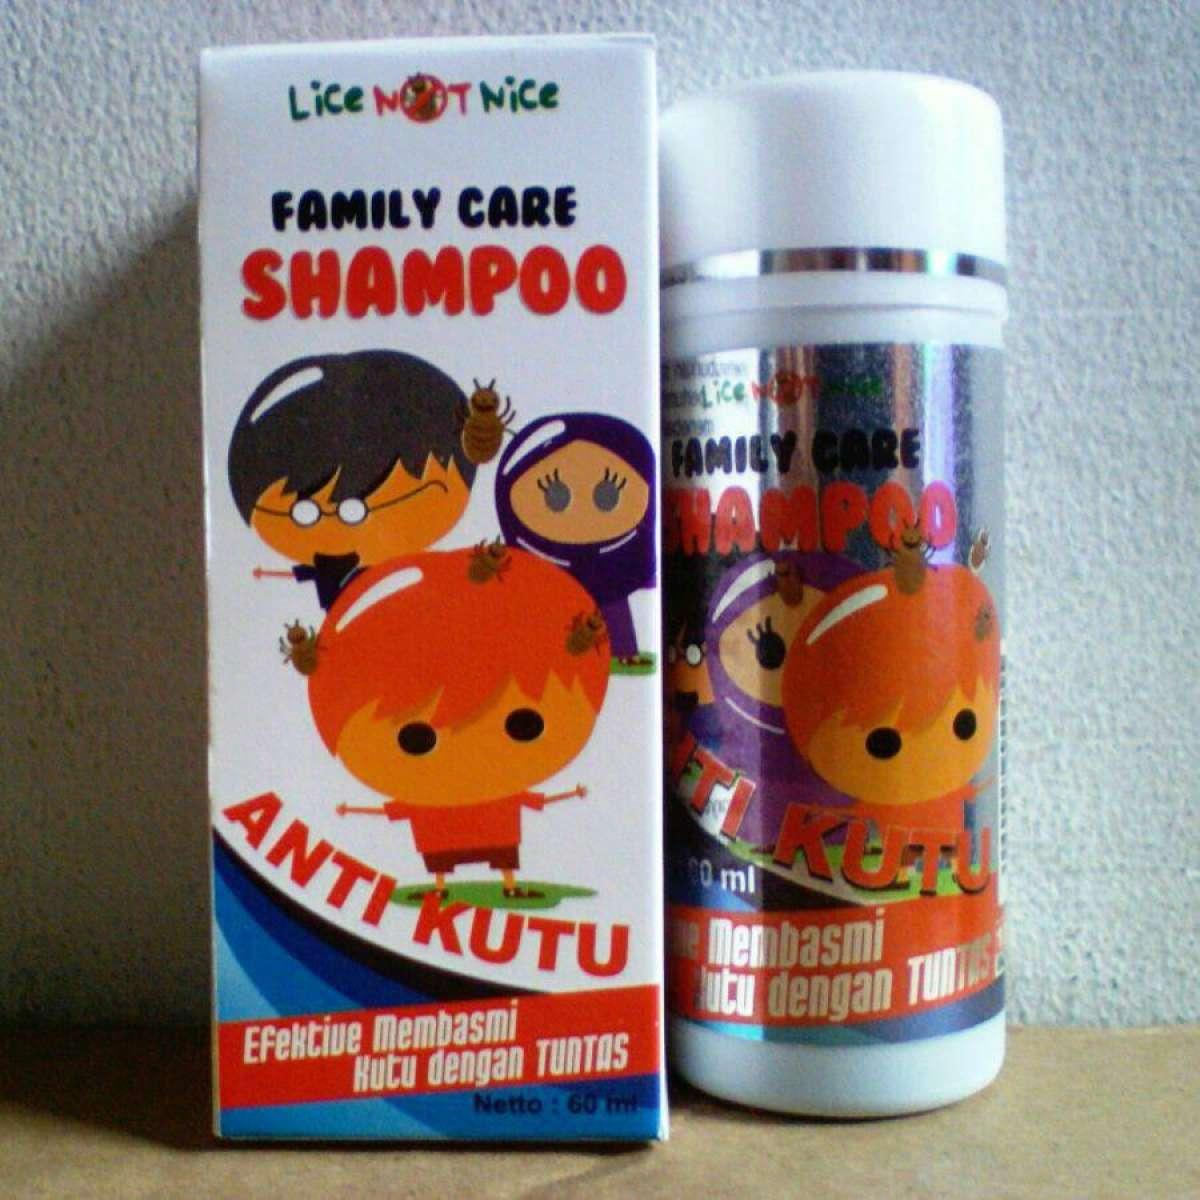 Family Care Shampo Shampoo Anti Kutu Lice Sampo Rambut Keramas By Khaira Shops.